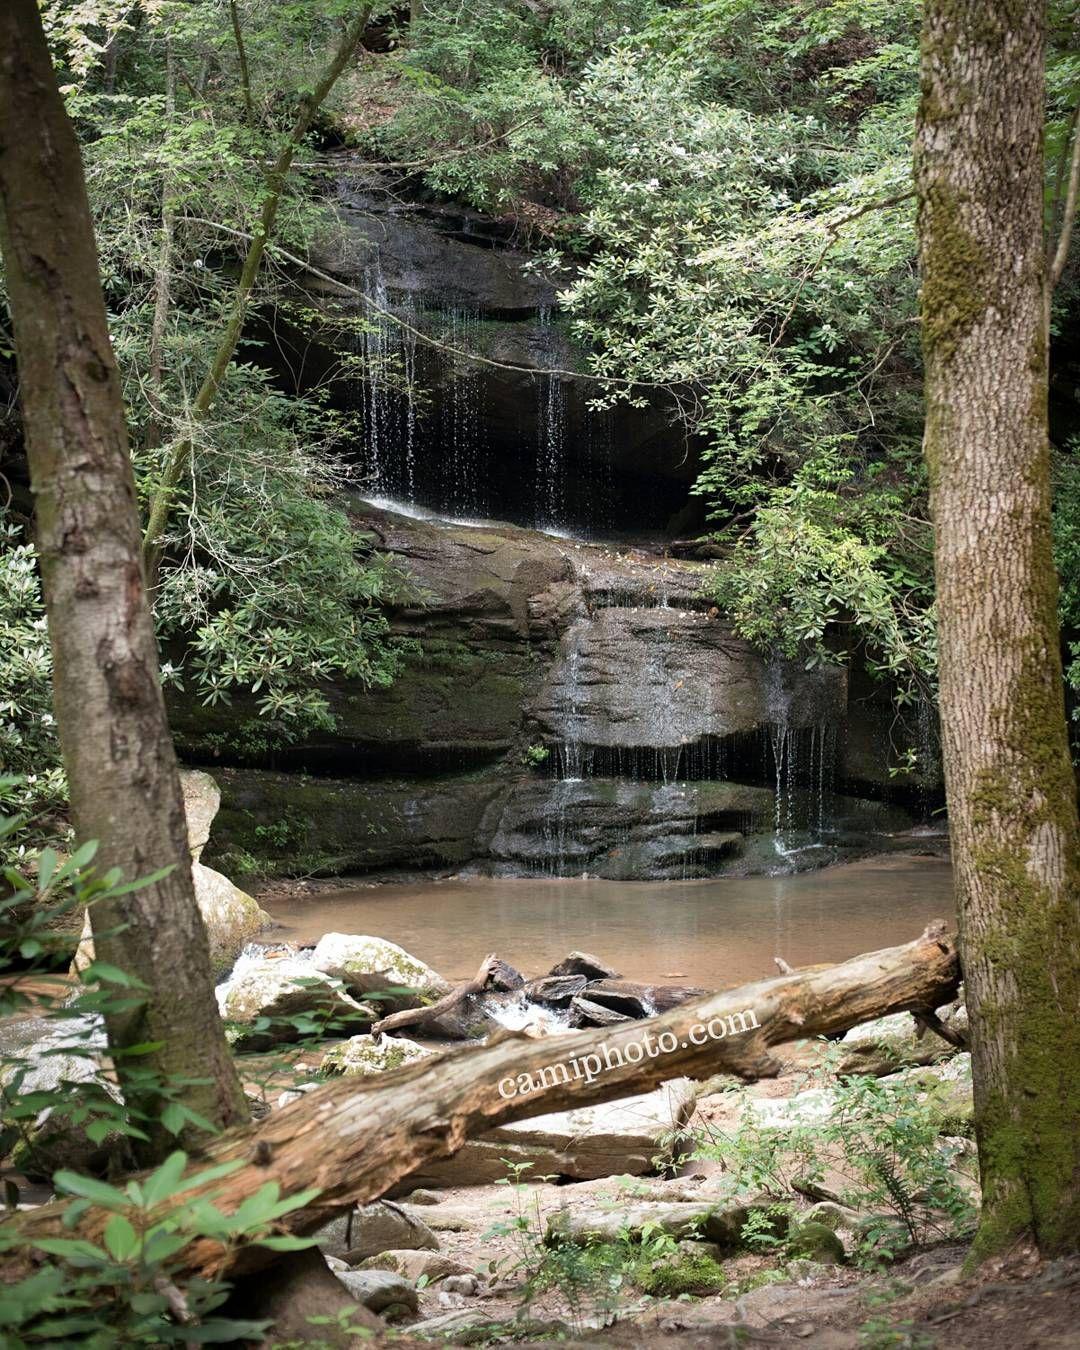 Moore Cove Waterfall | Visit NC Smokies |Small Cove Waterfall